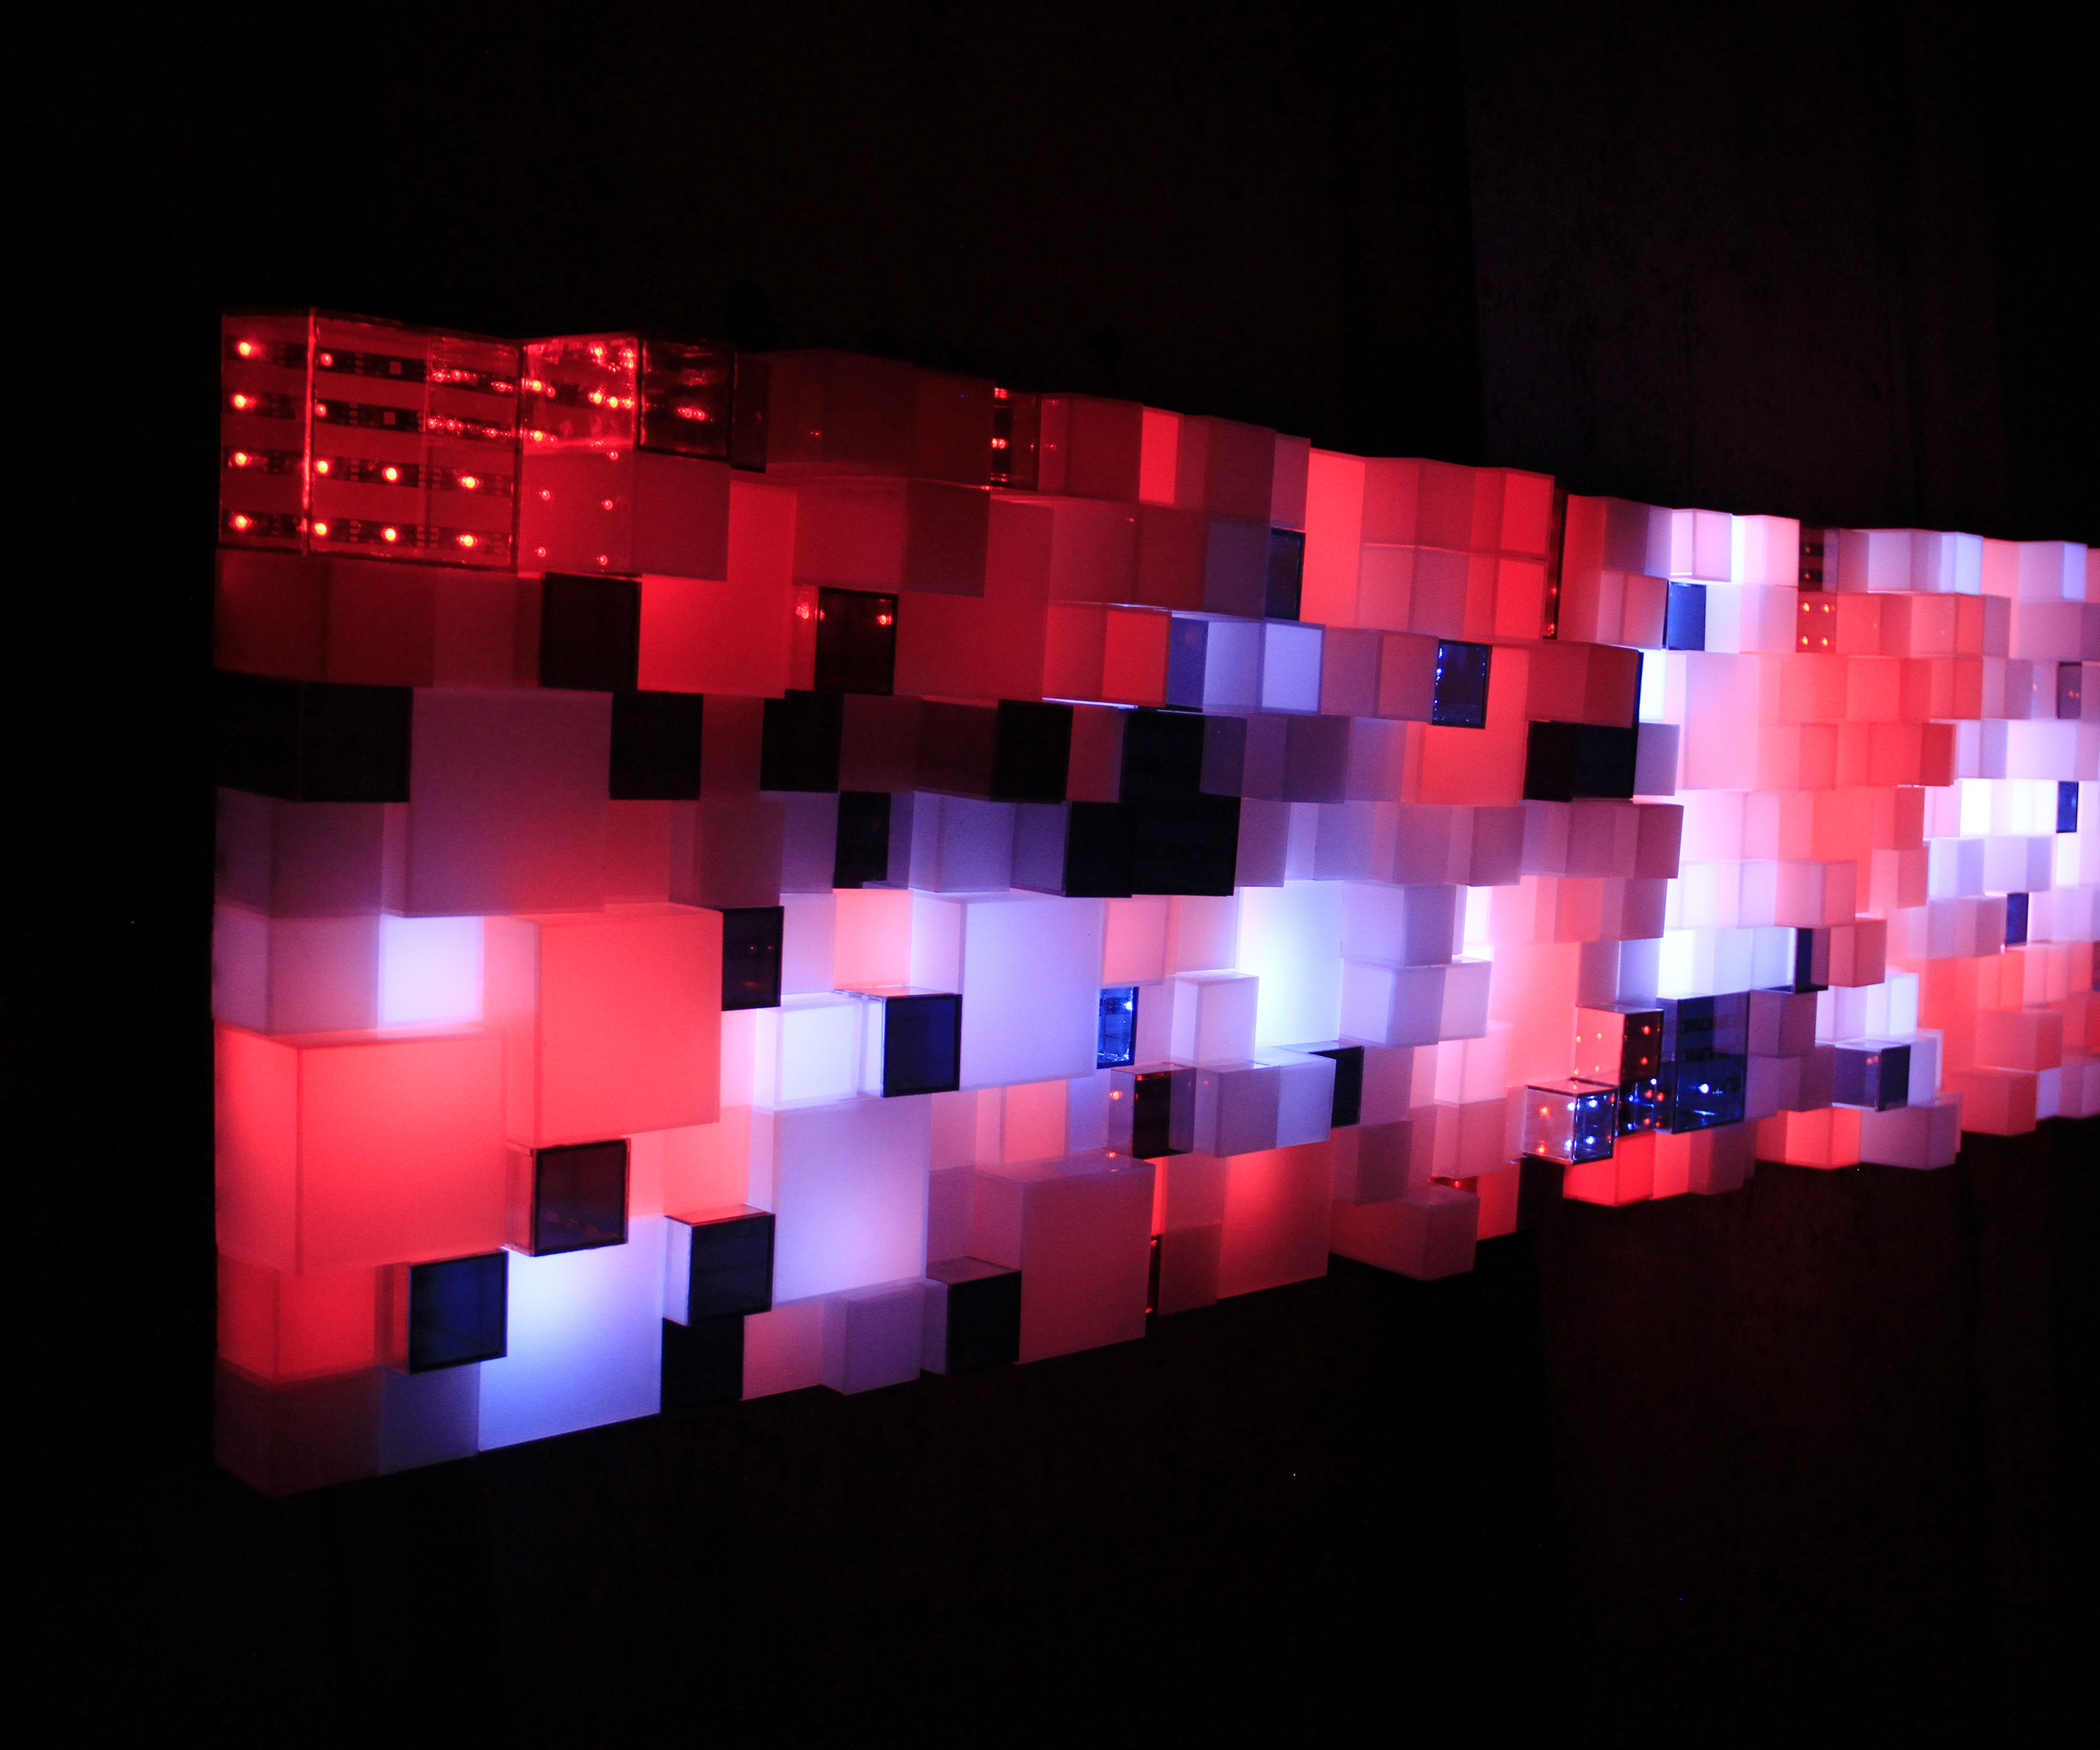 Lux Aeterna - Data Enabled Light Sculpture